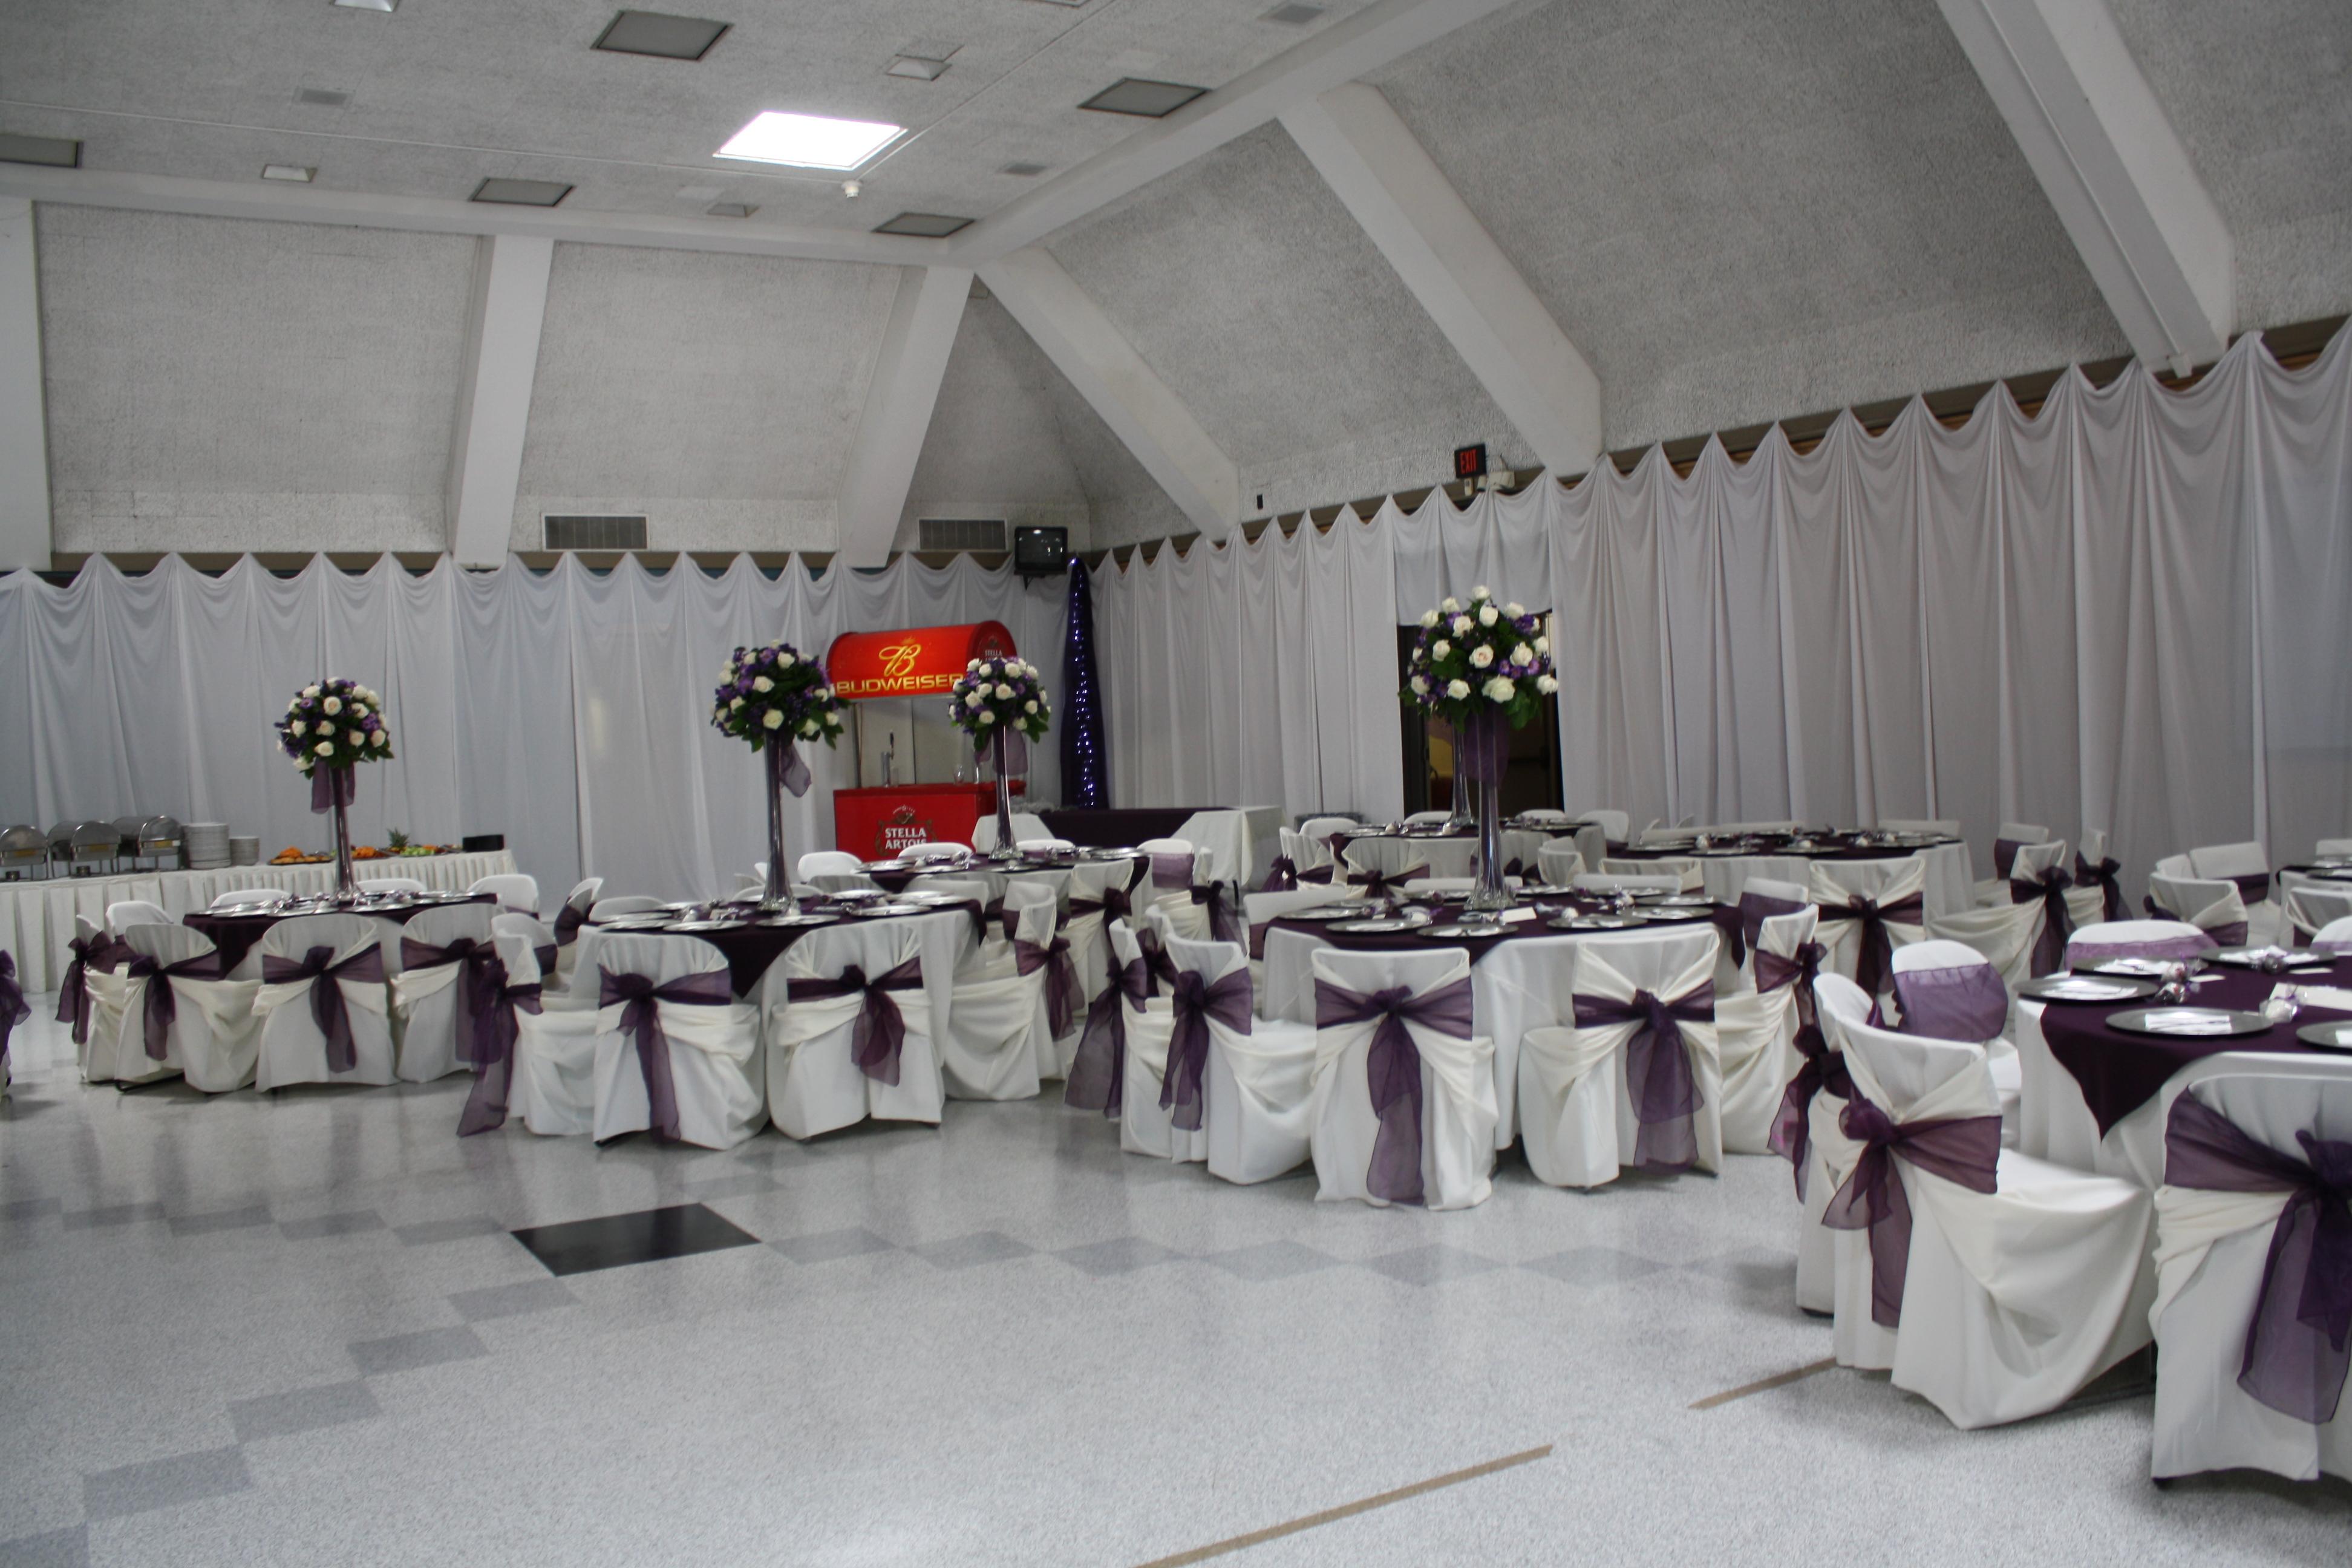 Spring Valley Halloween Event, Washington, Dc, 2020 Spring Valley Community Center | Venue, Spring Valley